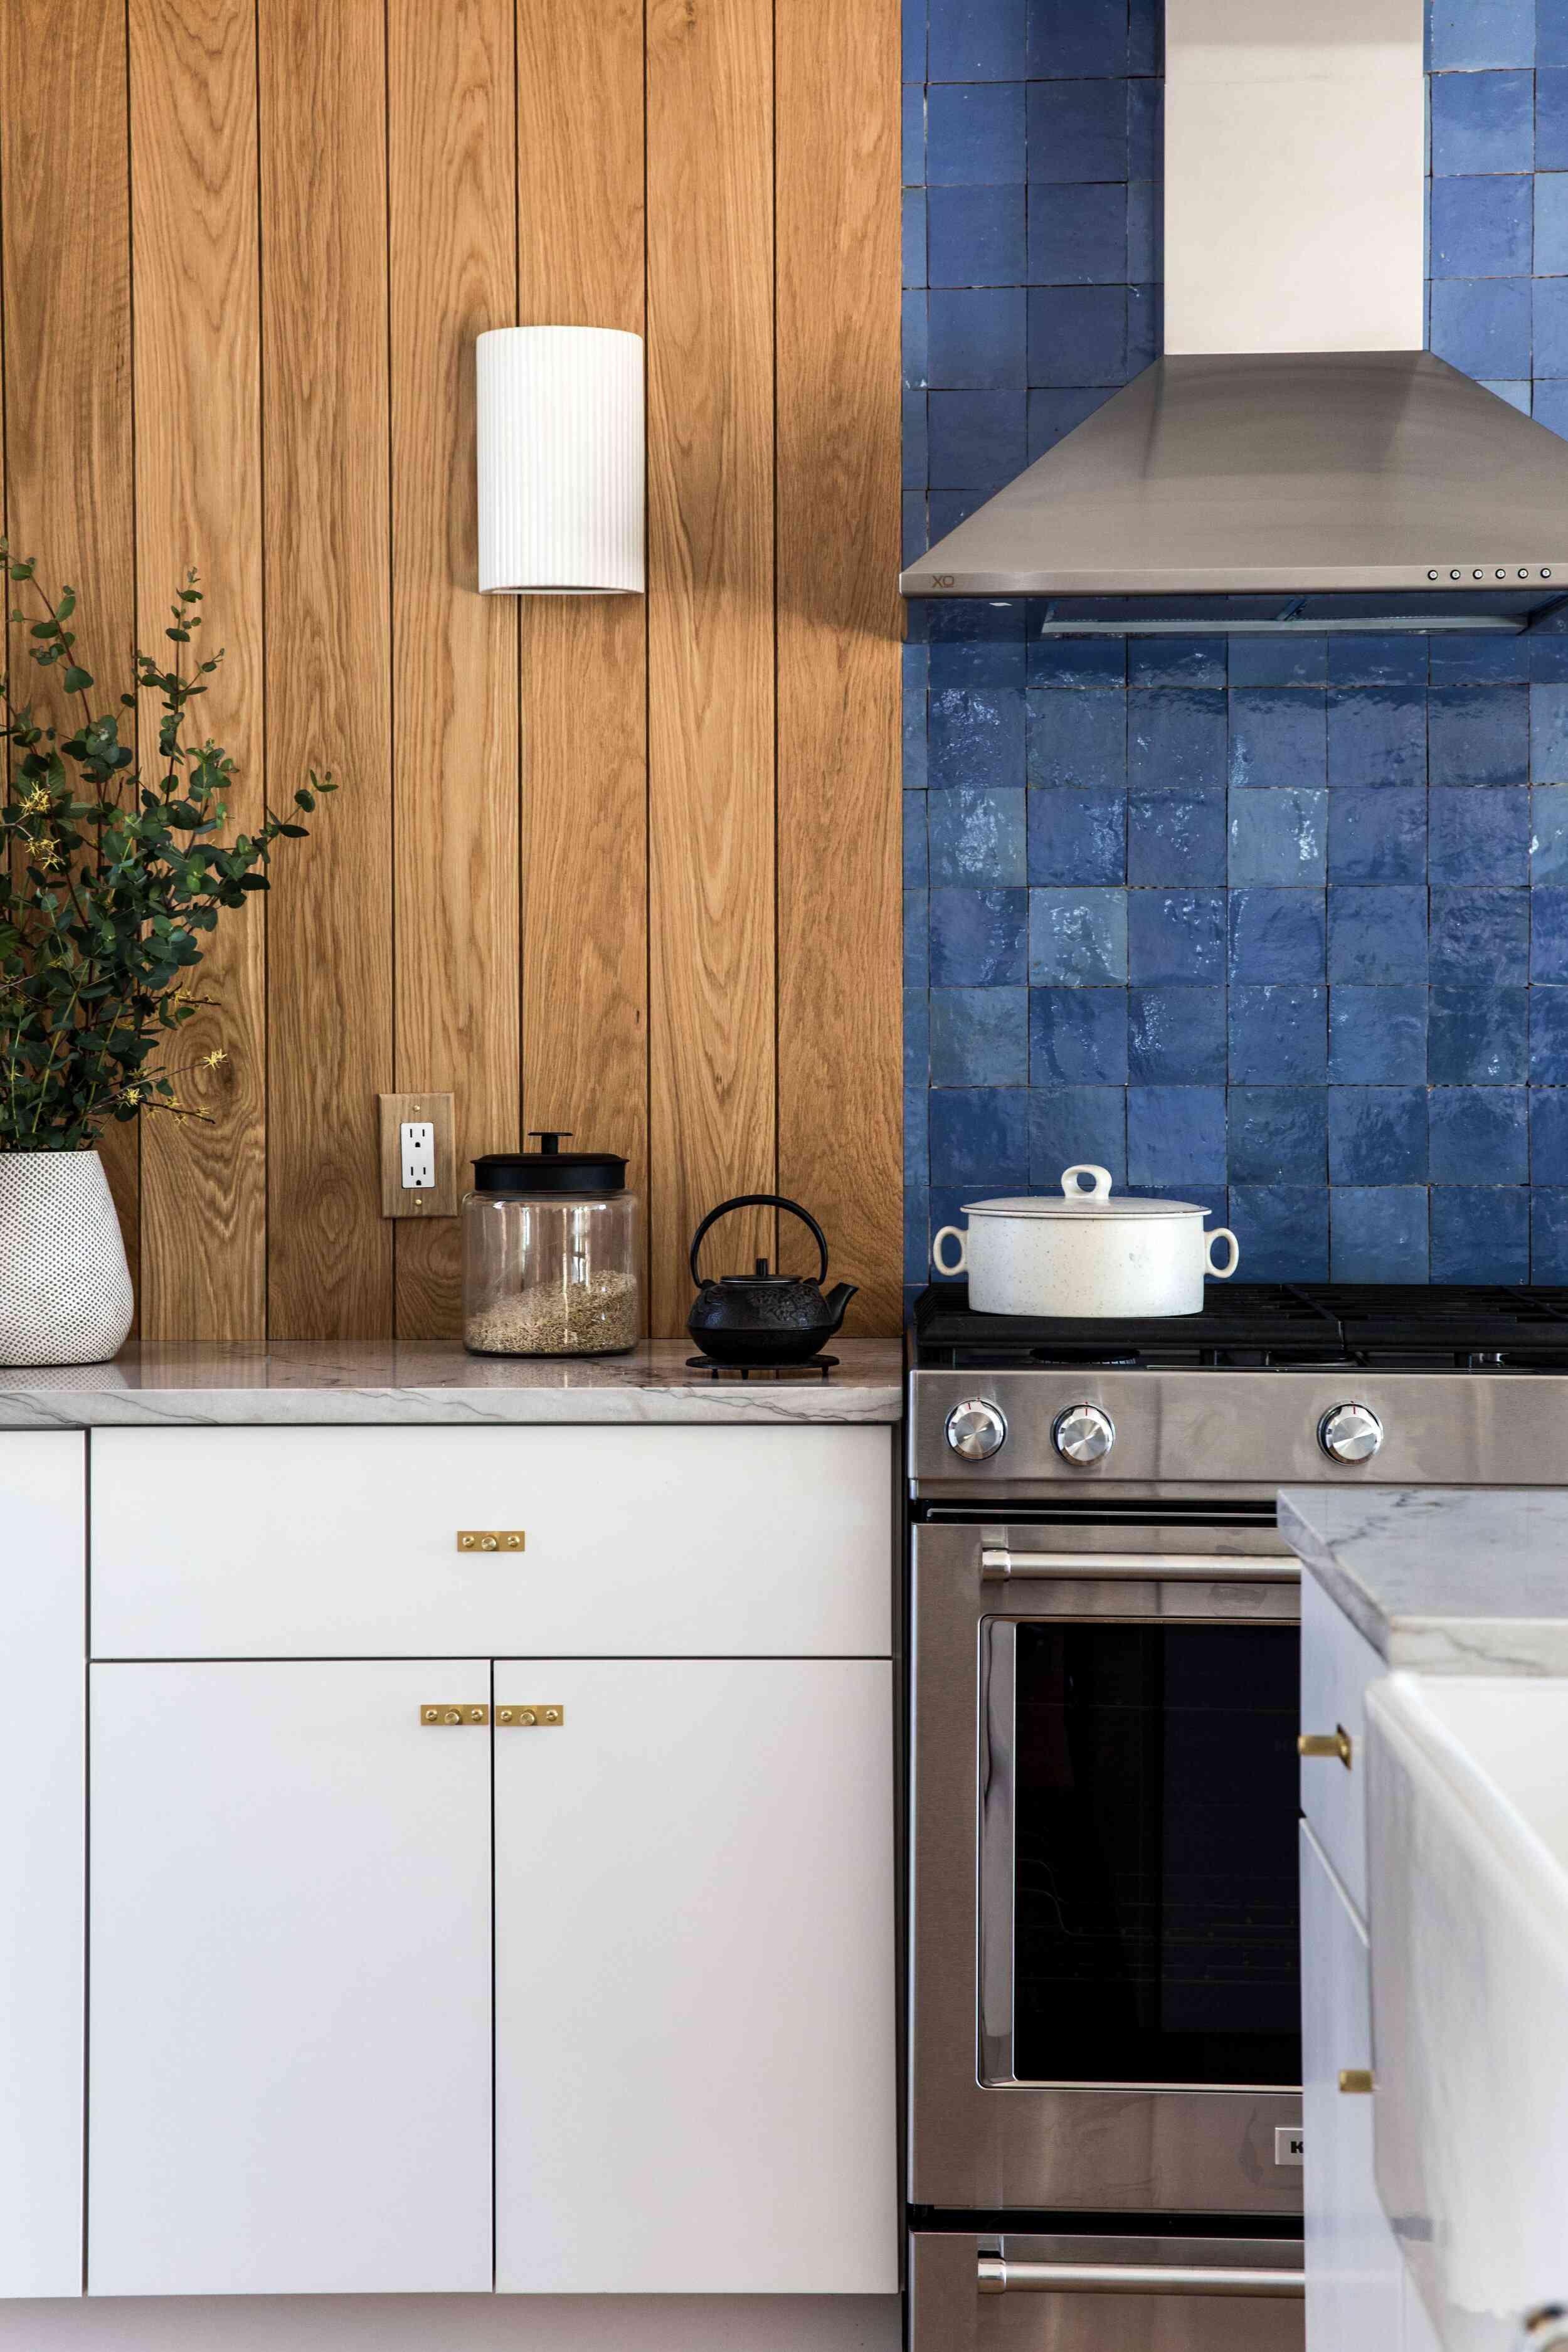 A kitchen backsplash crafted from bold blue tiles